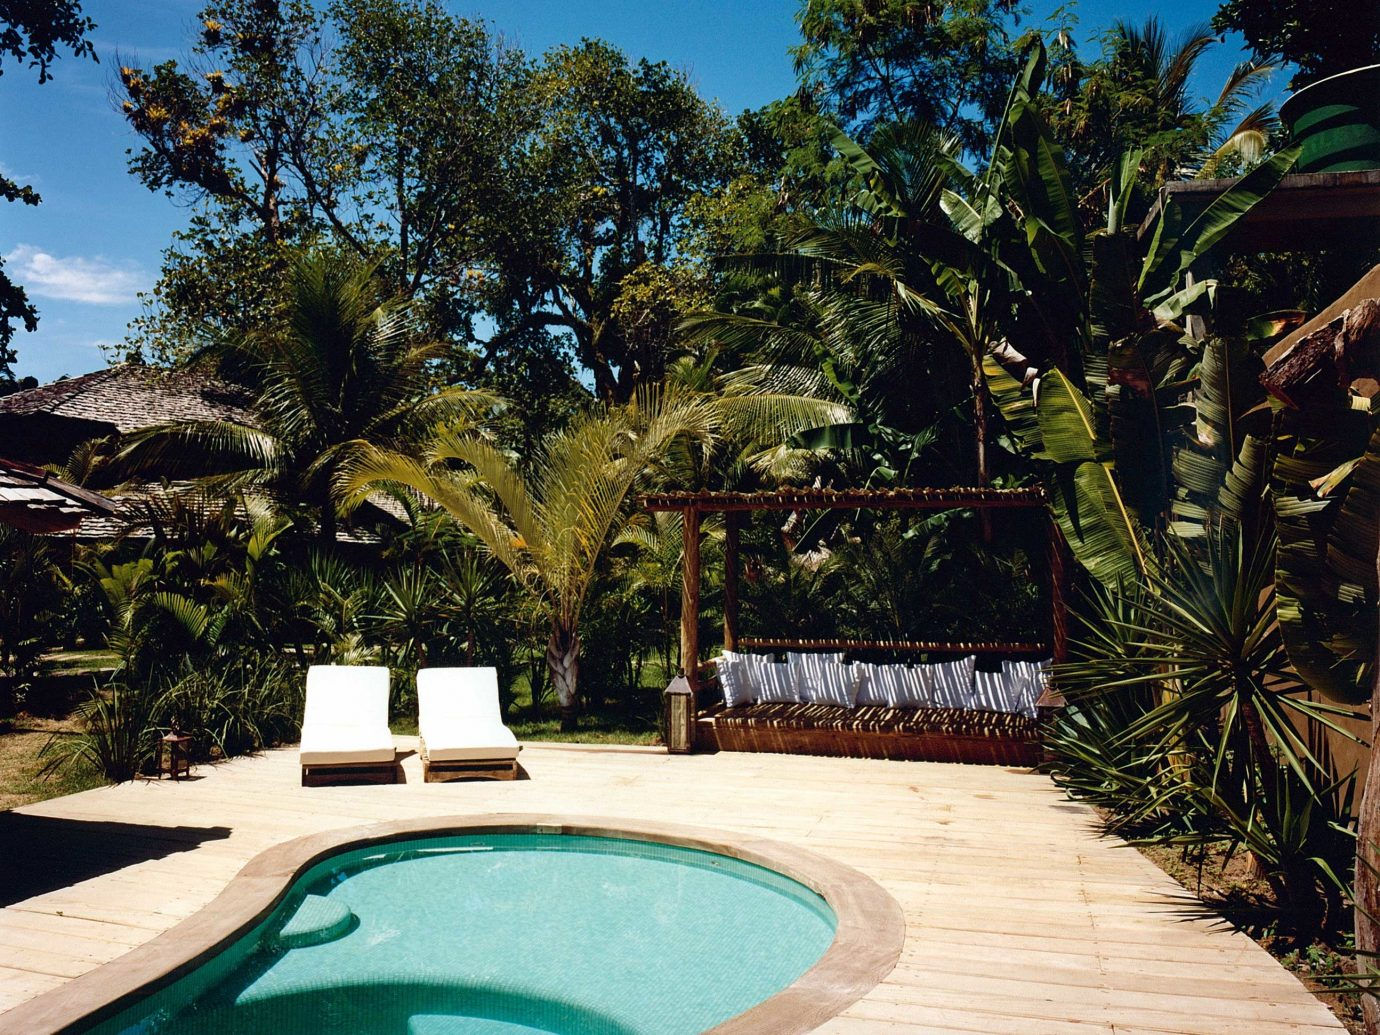 Pool at Uxua Casa Hotel & Spa